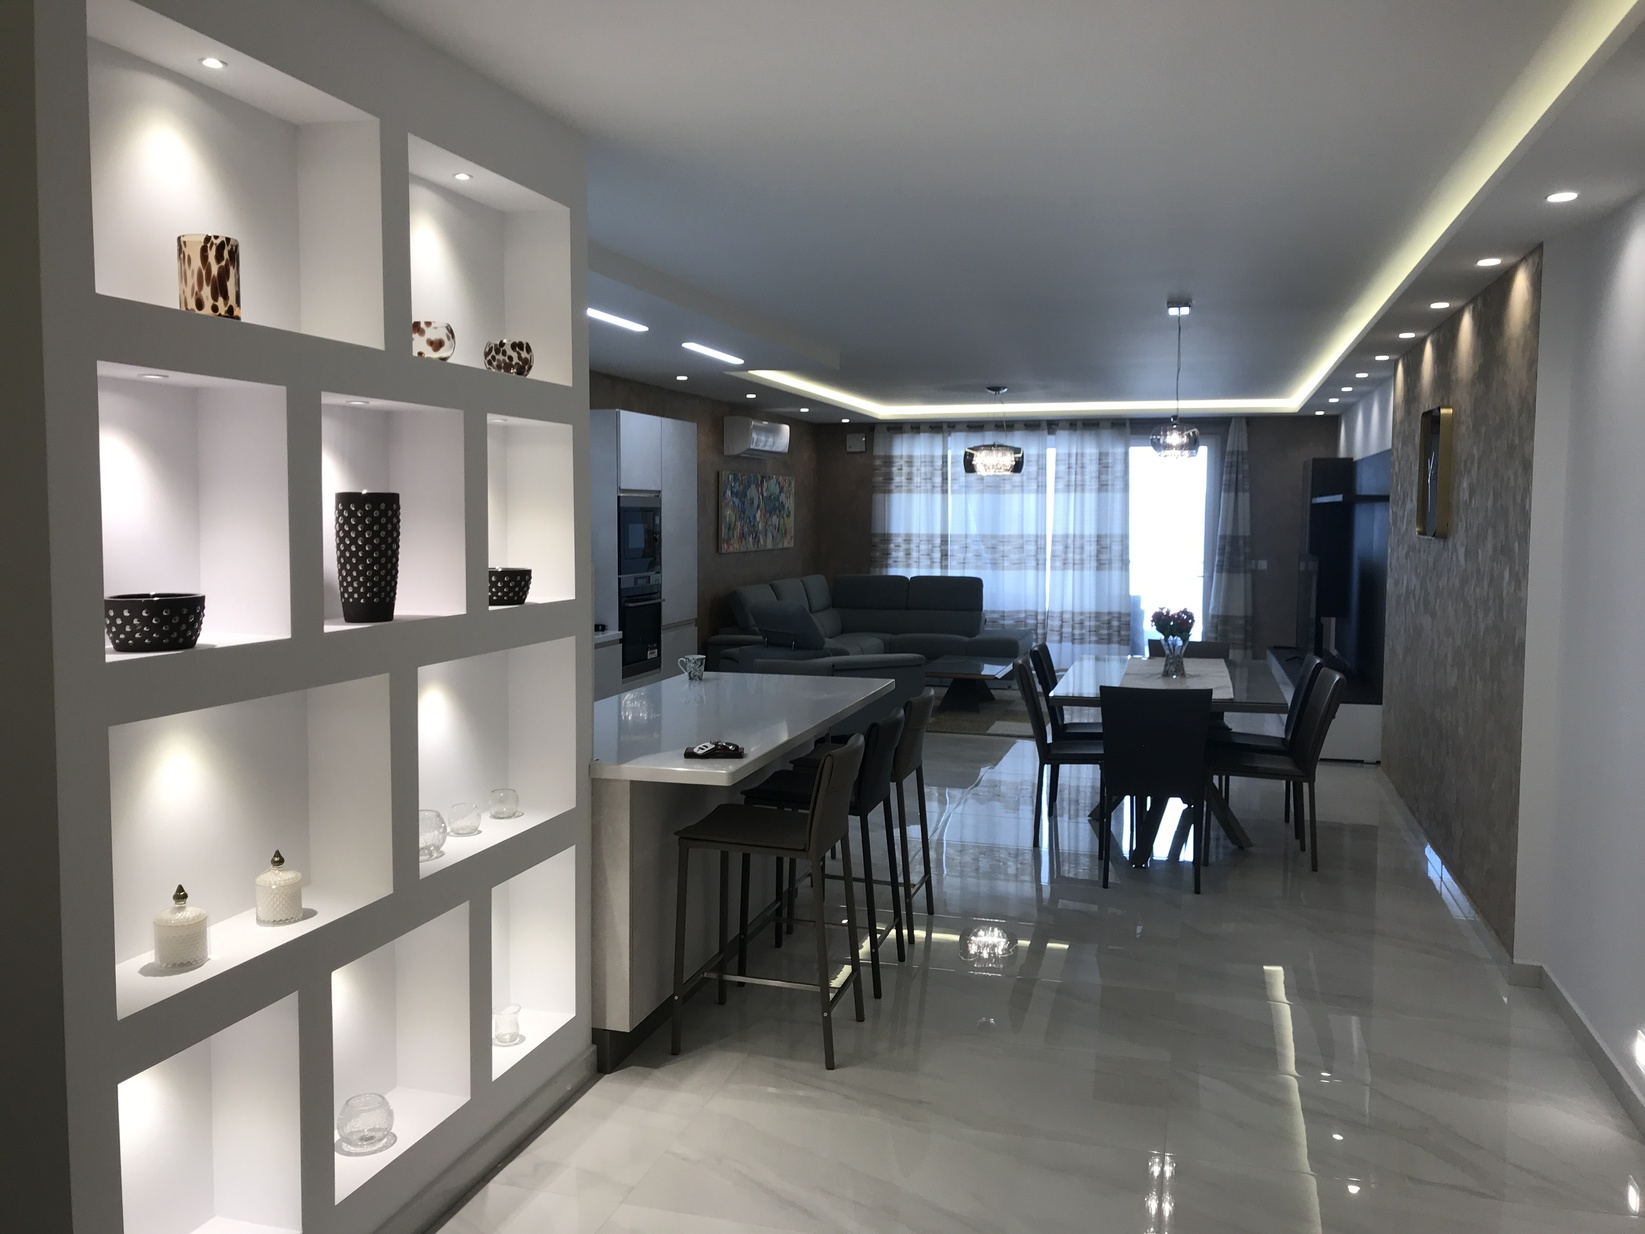 3 bed Apartment For Rent in Qawra, Qawra - thumb 3